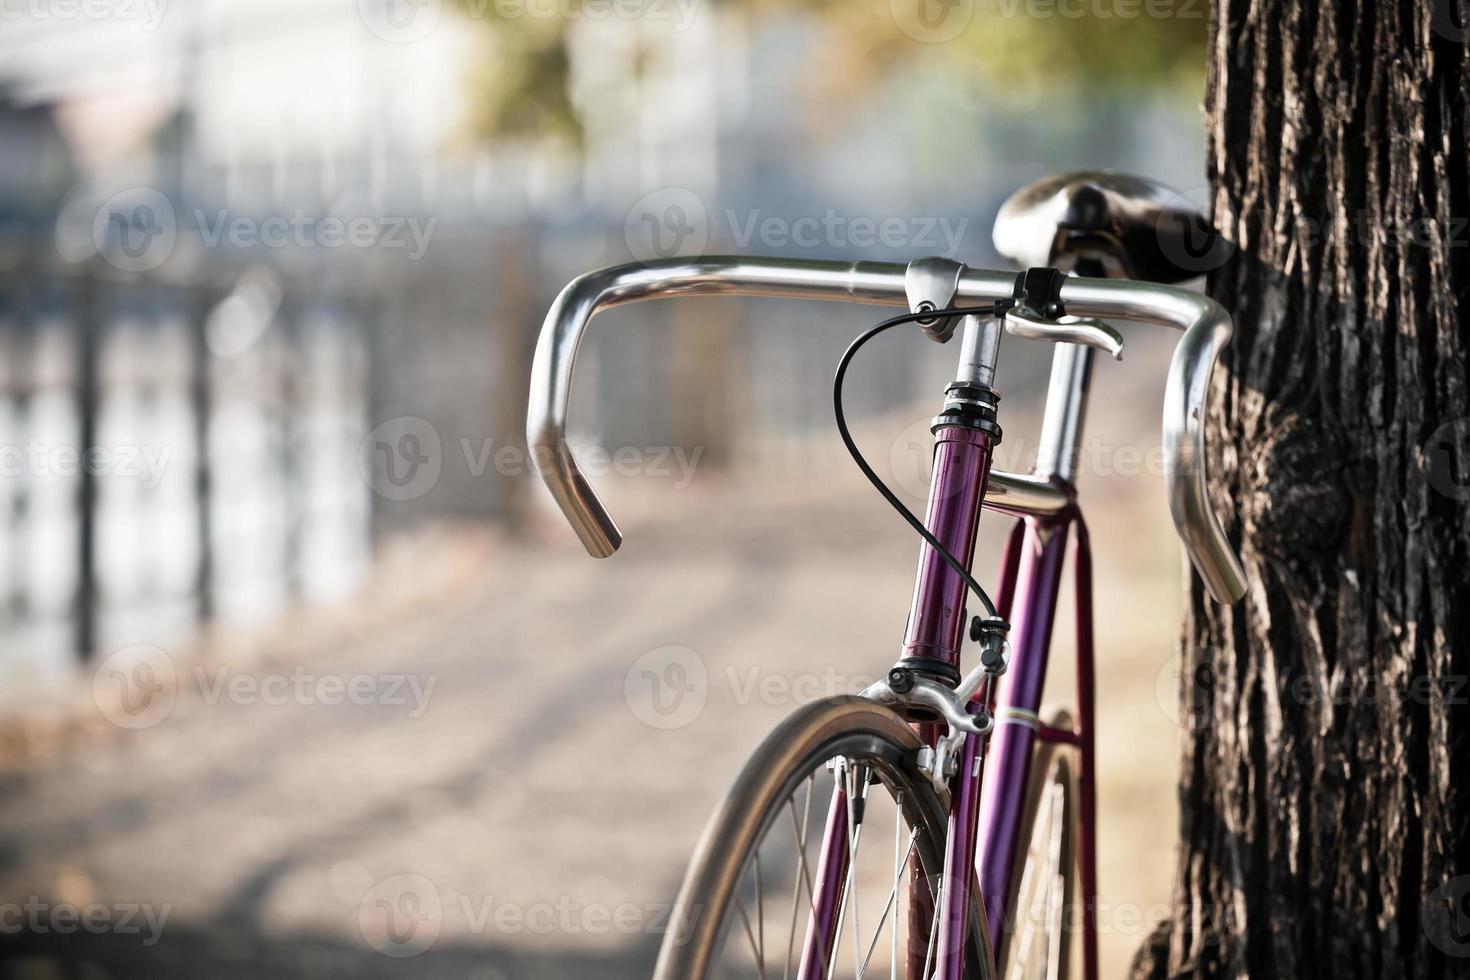 en lila cykel lutad mot ett träd foto